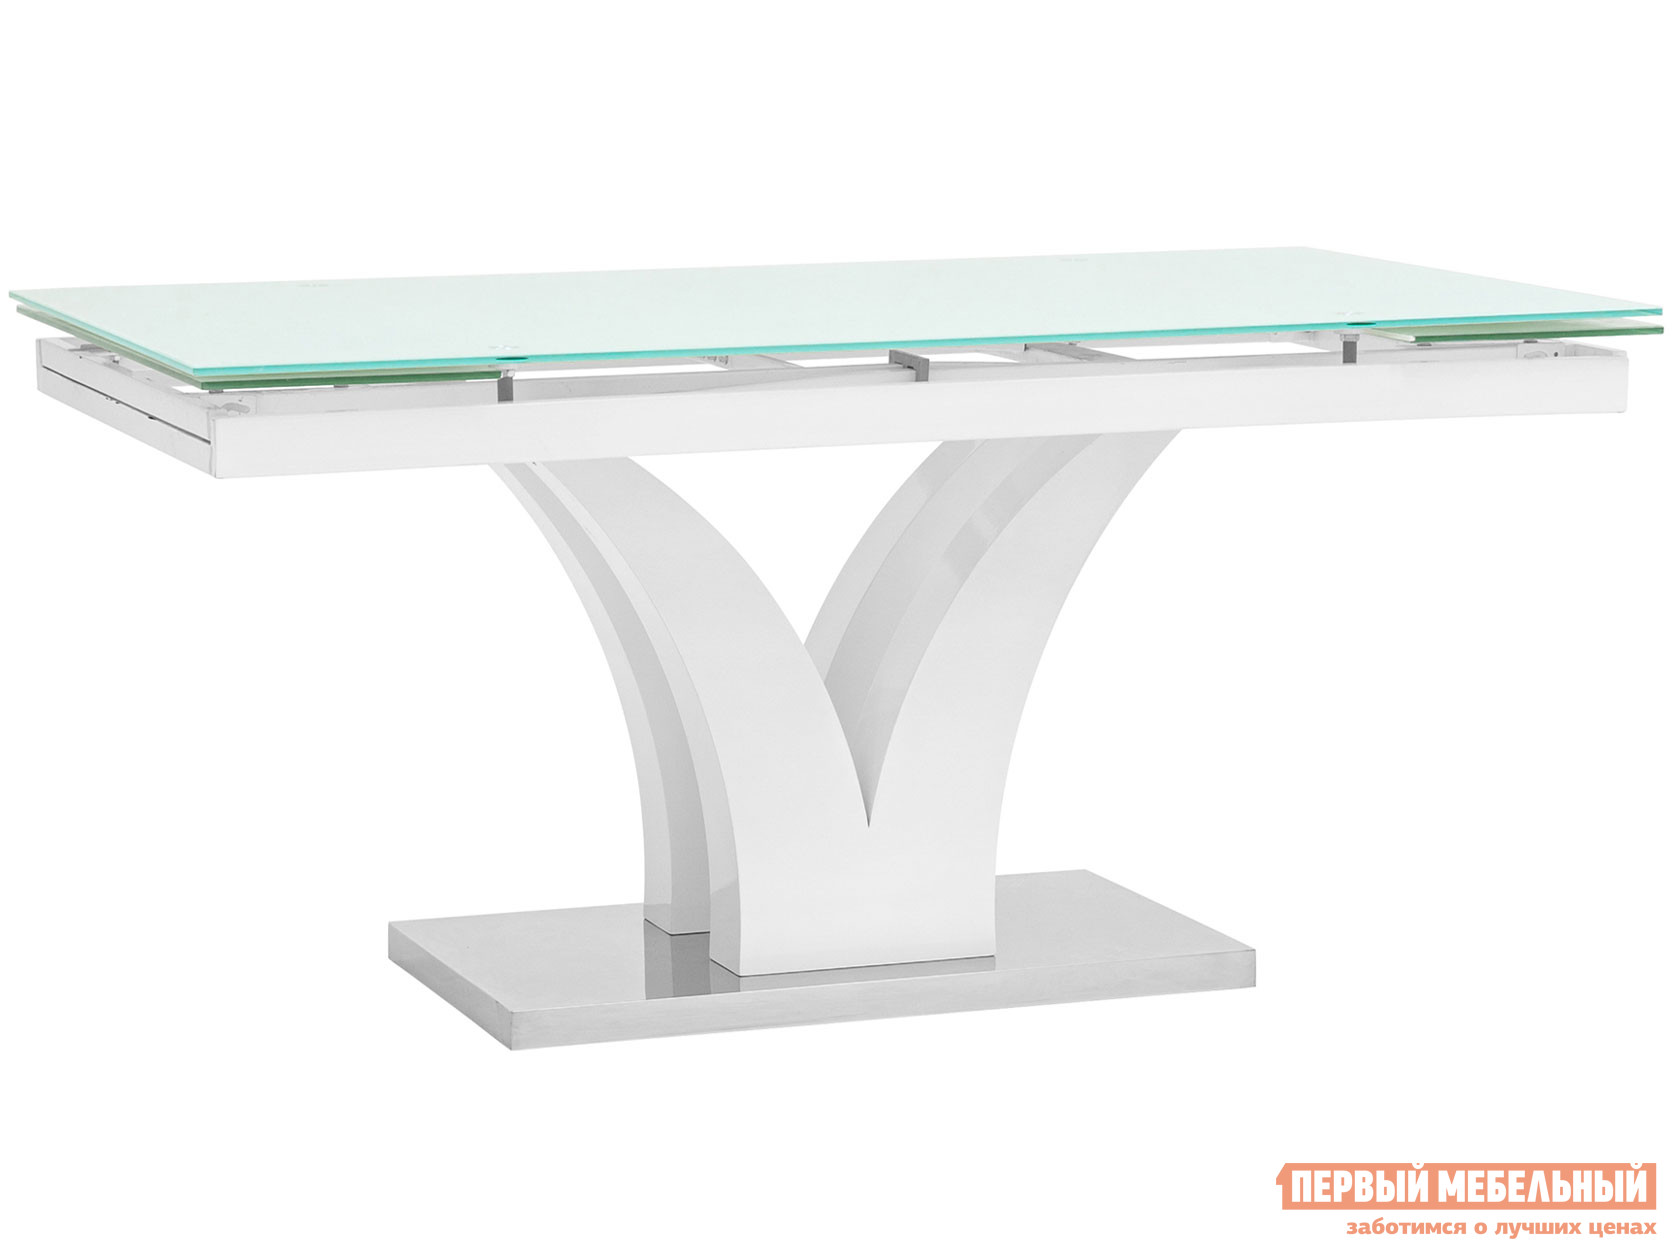 Кухонный стол  обеденный Верона, раскладной DT-43-160-HGW/HGBG DUAL Белый глянцевый STOOL GROUP 111419